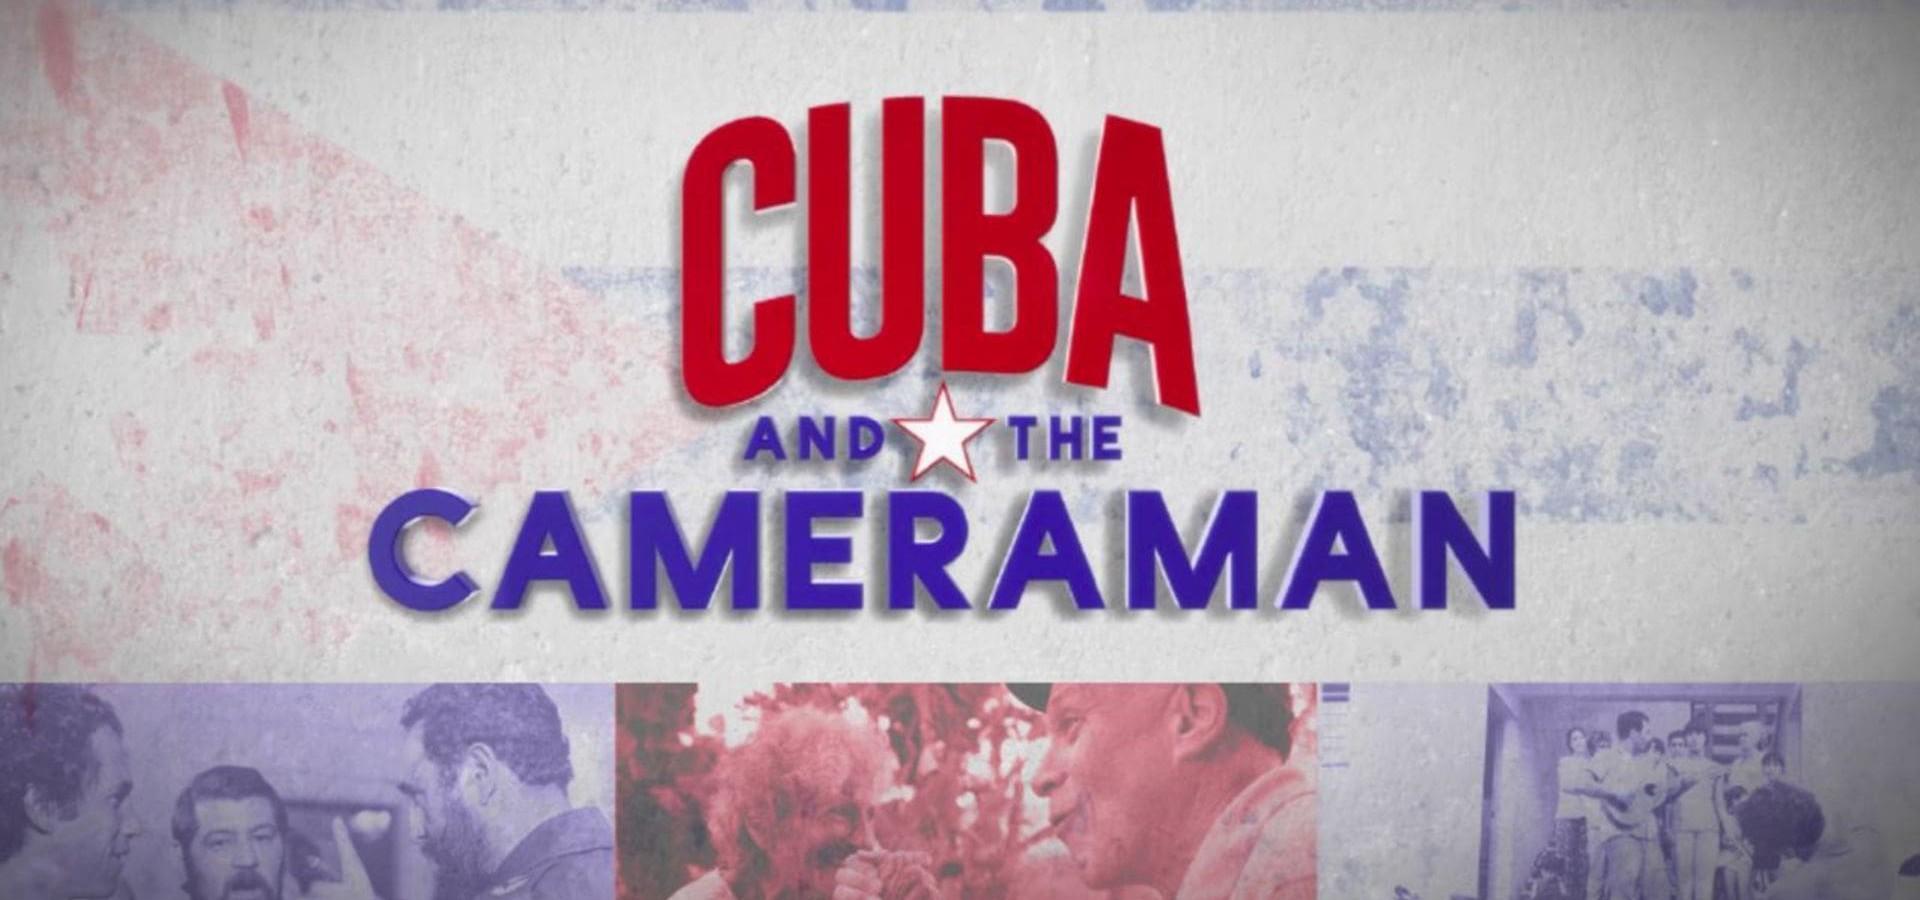 Cuba and the Cameraman